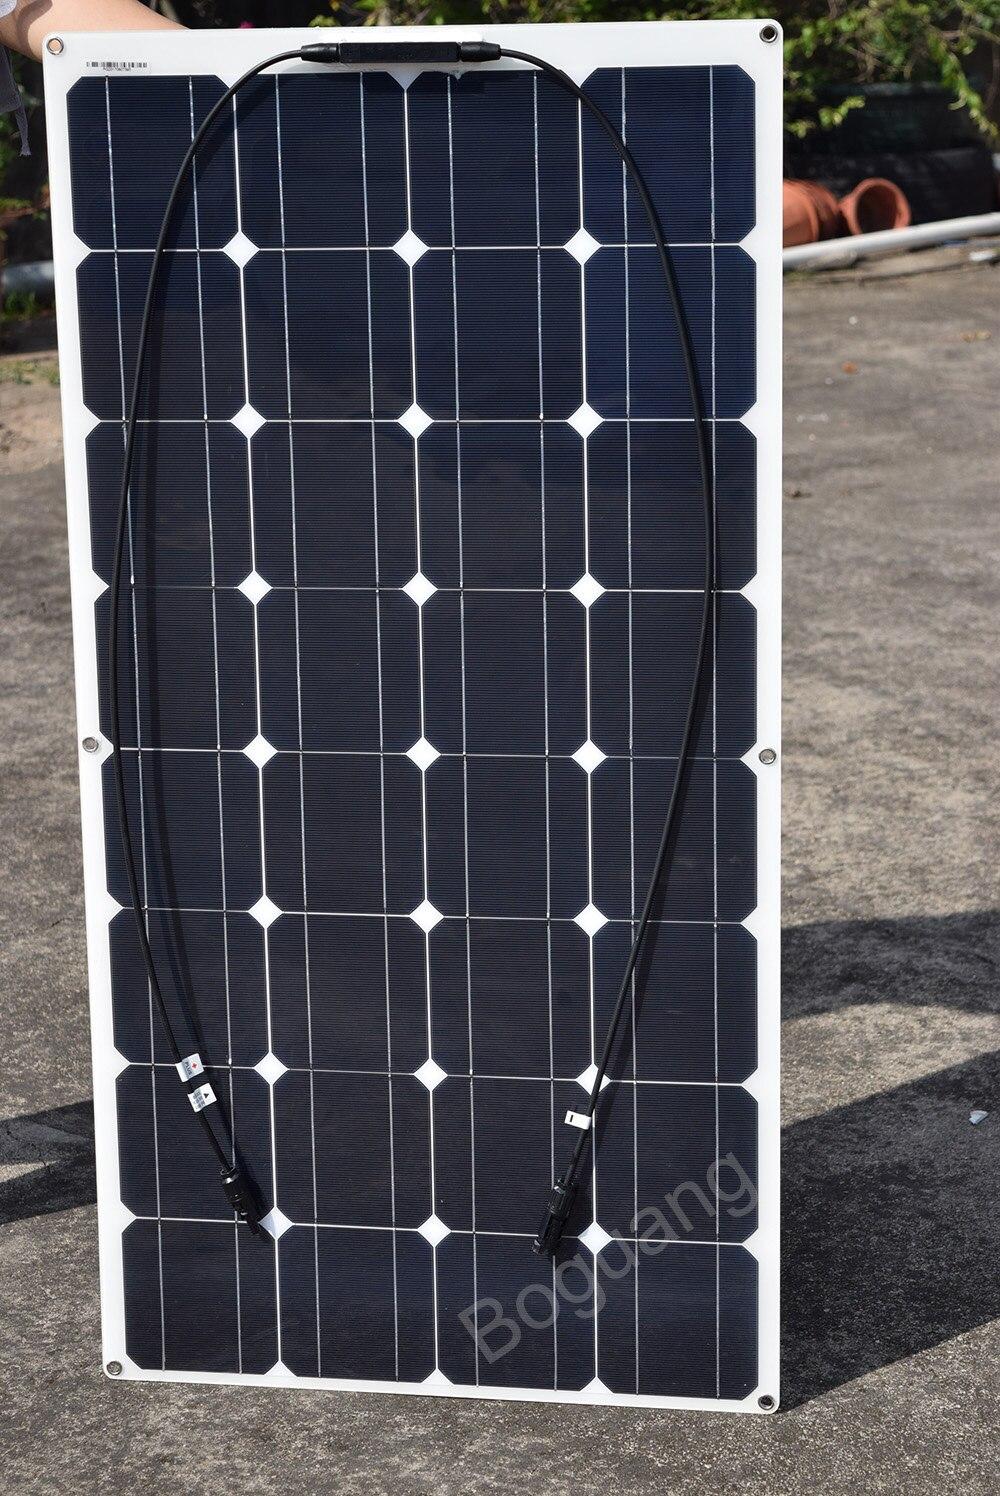 Boguang 400 W solar panel solar sistema kit DIY 100 W Módulo 12 V/24 V/40A MPPT controlador de cable tipo Y MC4 cargador adaptador de corriente - 2